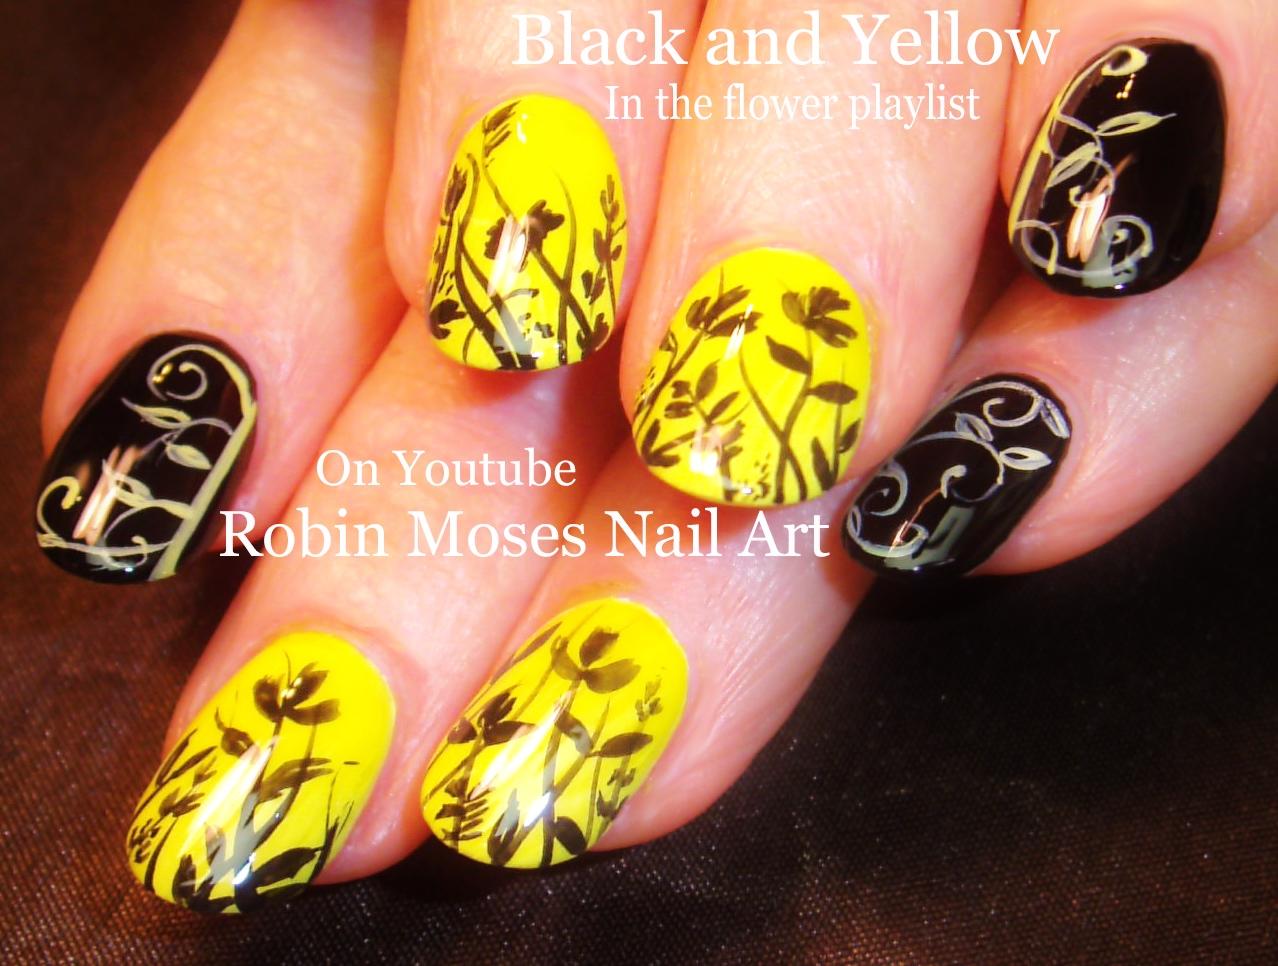 Robin Moses Nail Art: Elegant DIY Black and Yellow Design ...